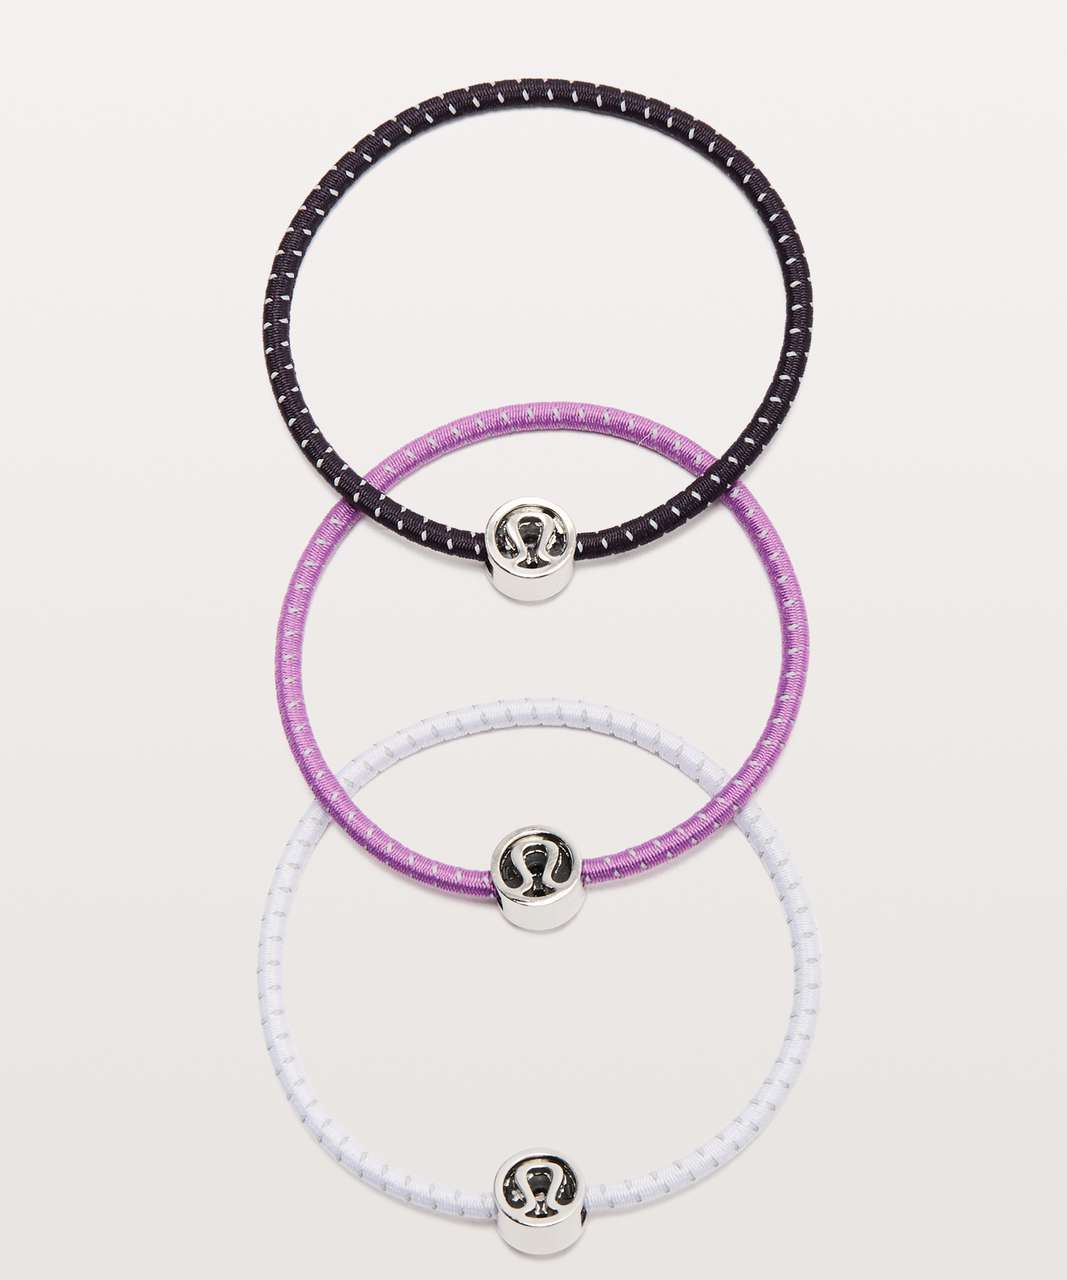 Lululemon Glow On Hair Ties - Cyber / Sheer Lilac / Purple Blossom